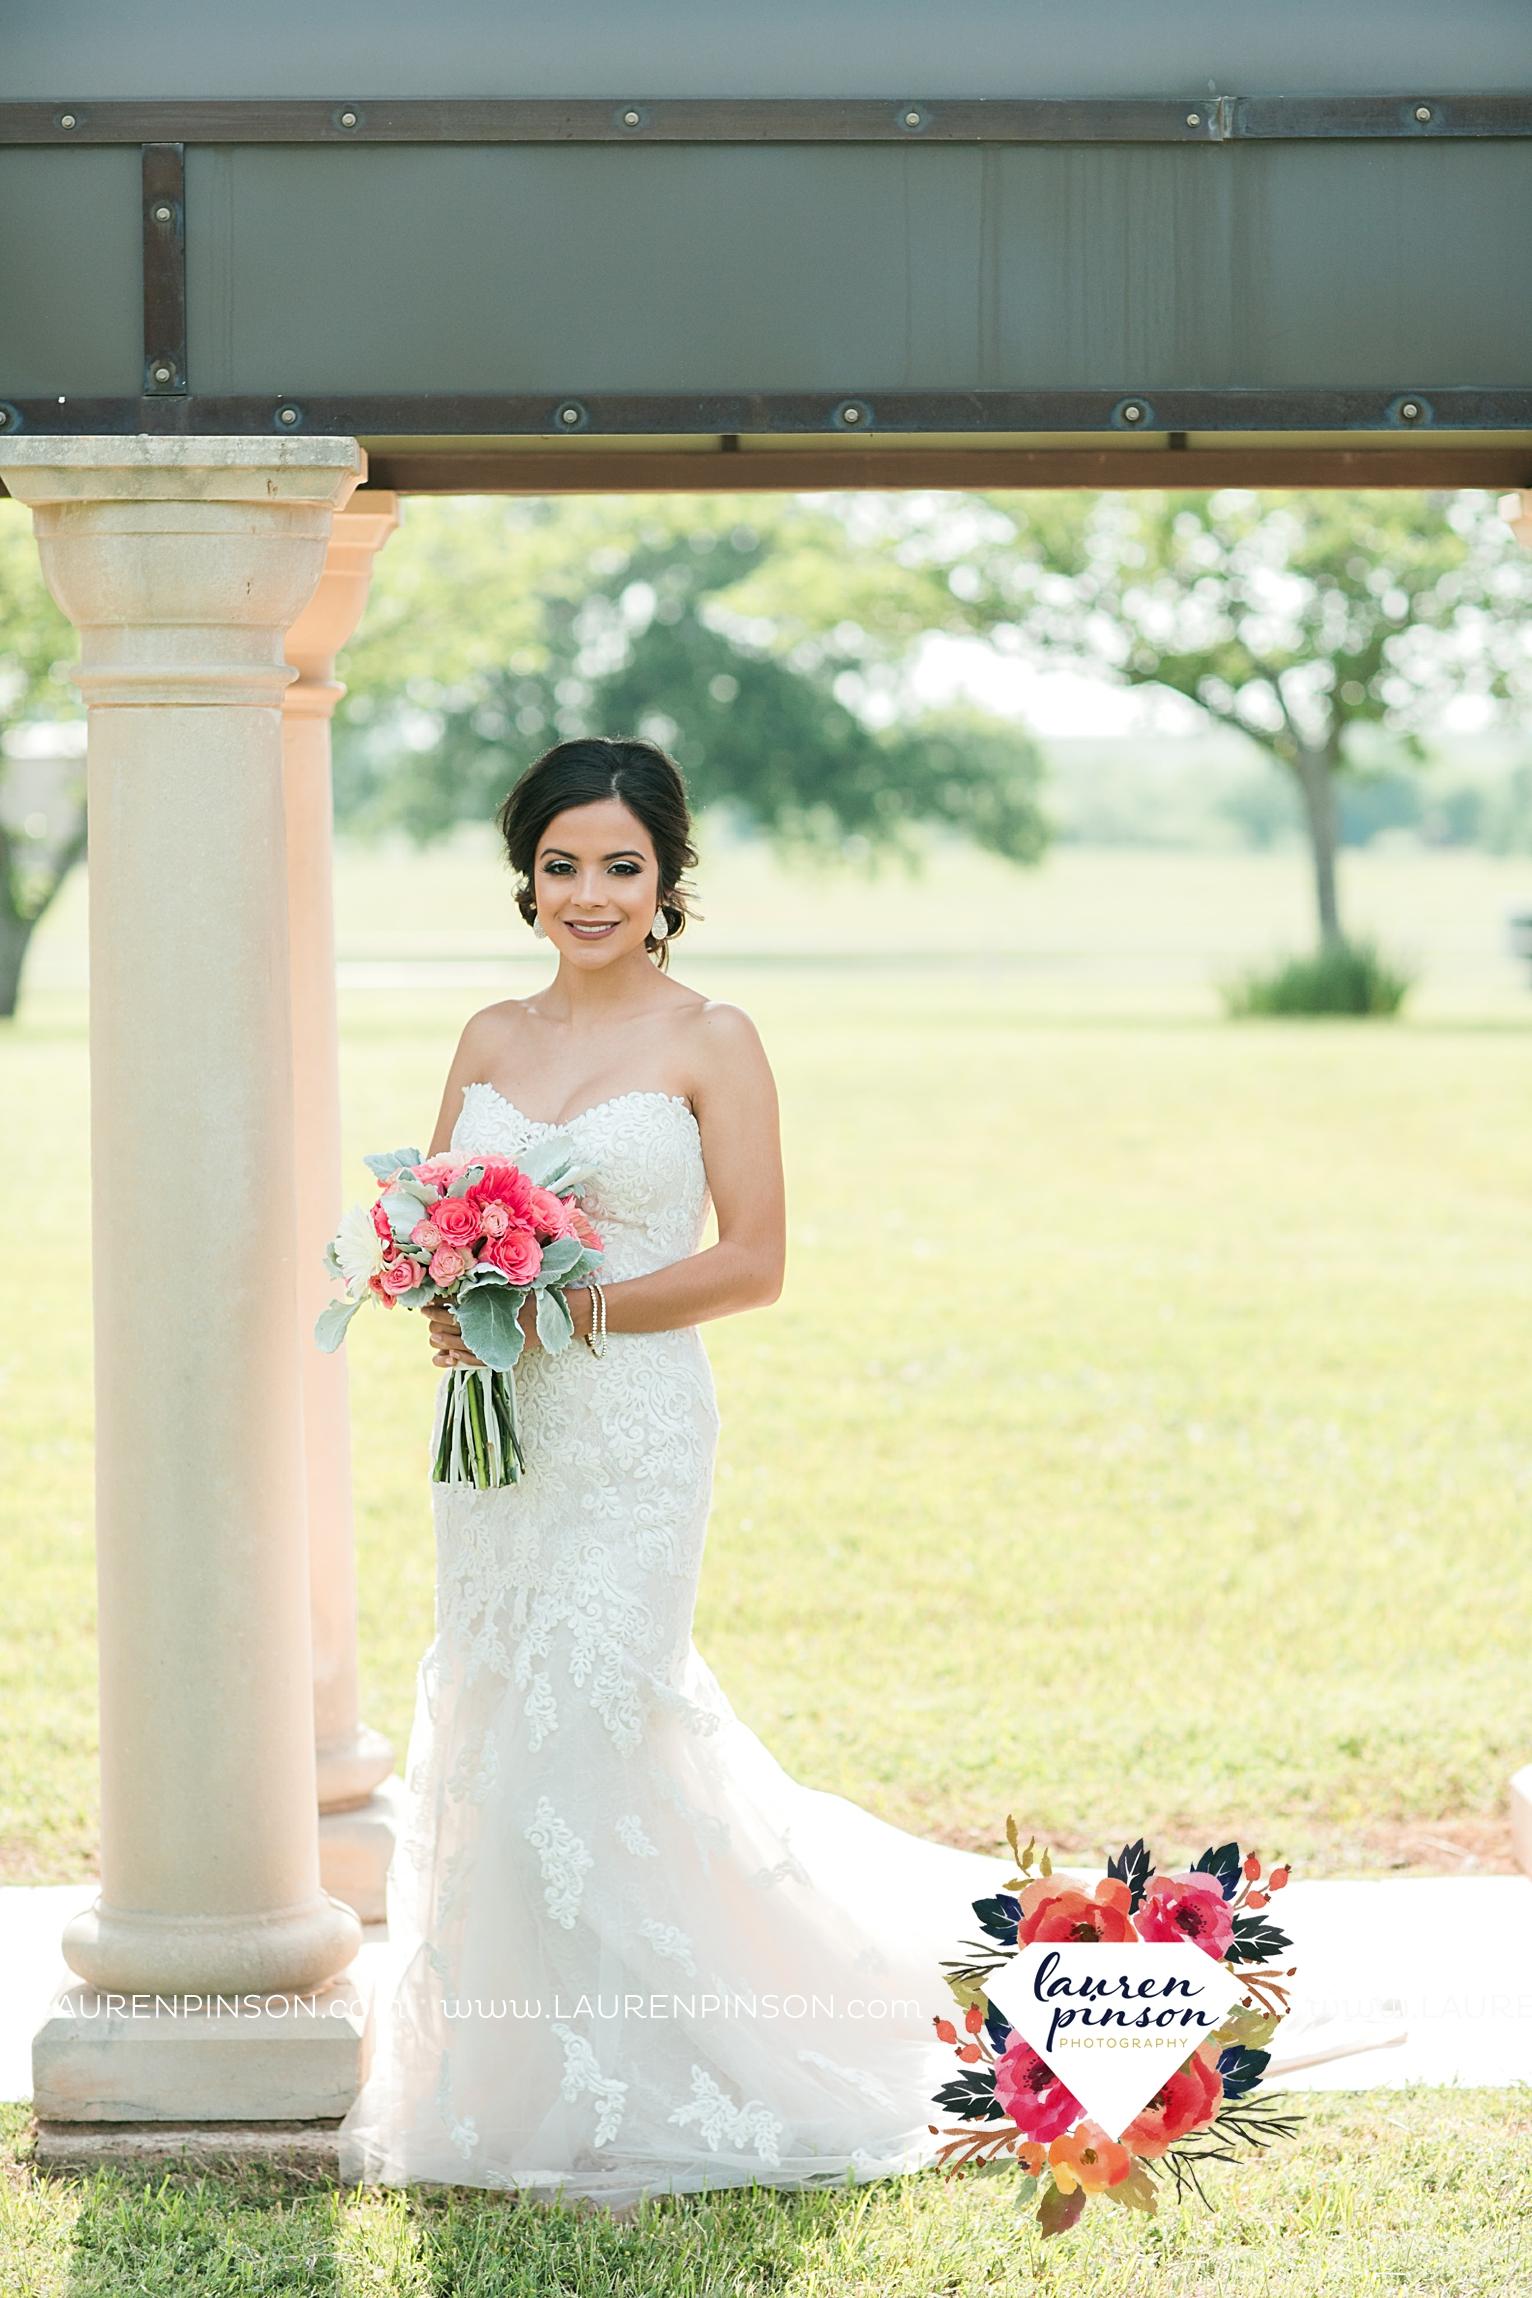 wichita-falls-wedding-nocona-comanche-rose-ranch-rustic-pink-gray-photography-00116.jpg